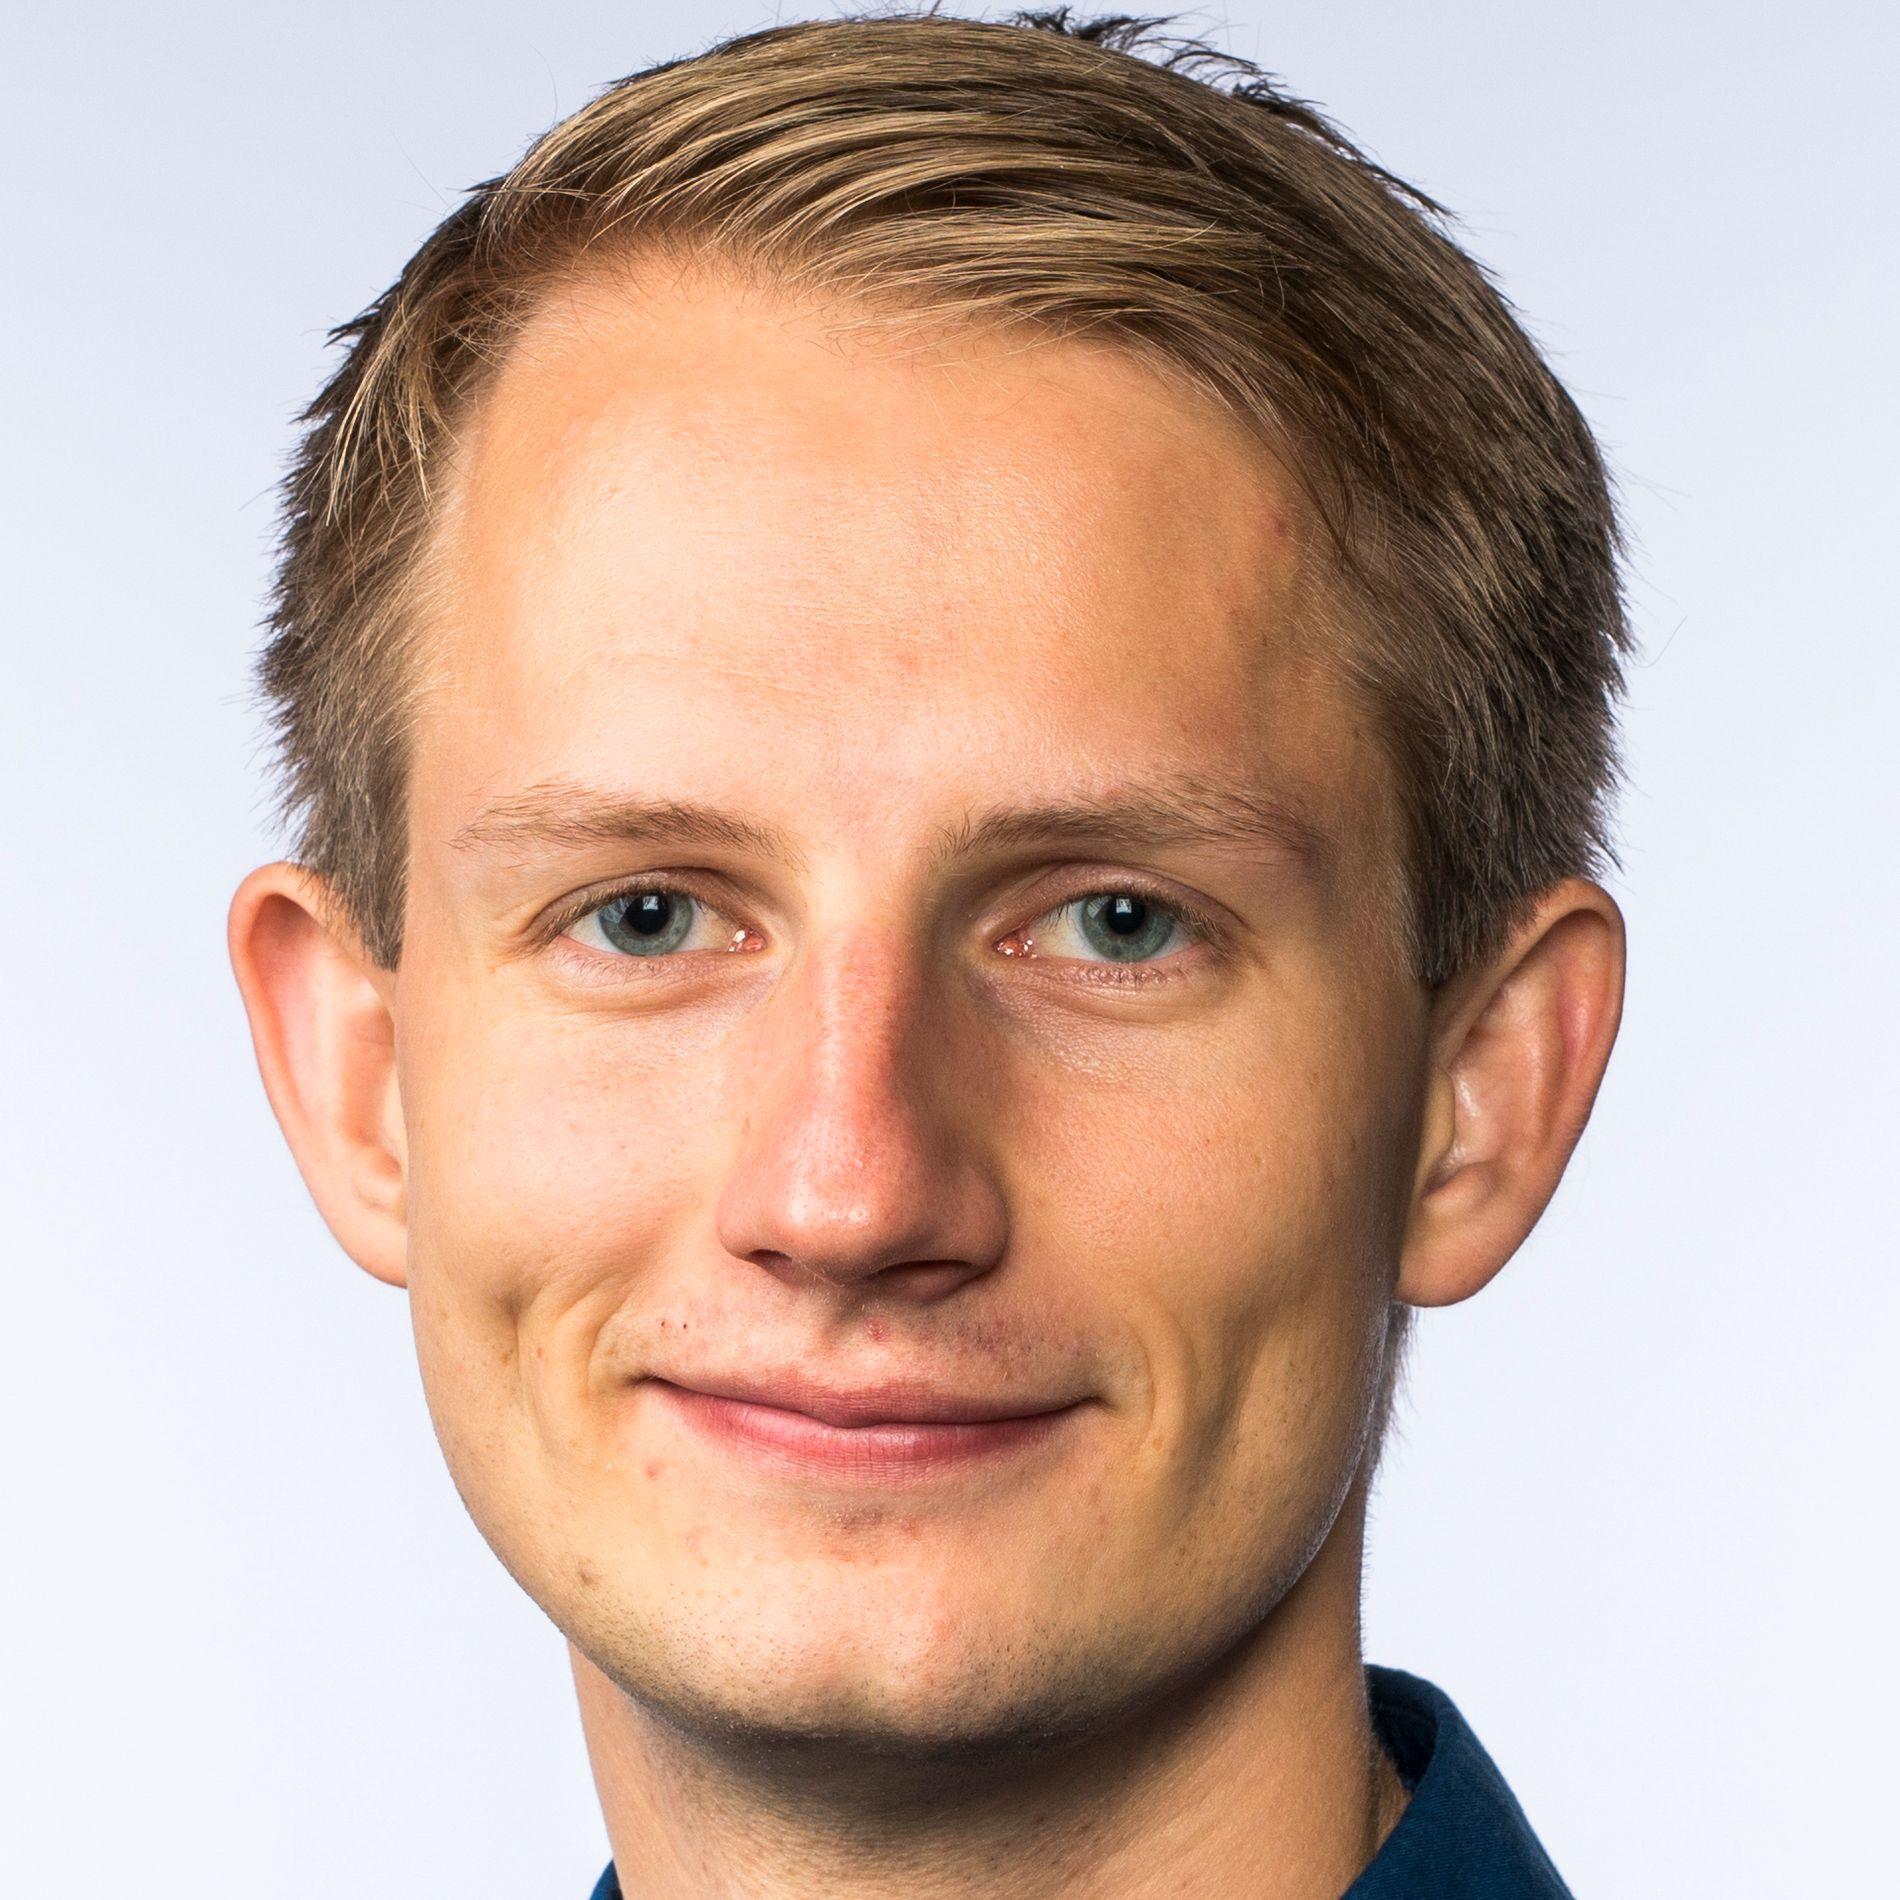 Aleksander Stokkebø